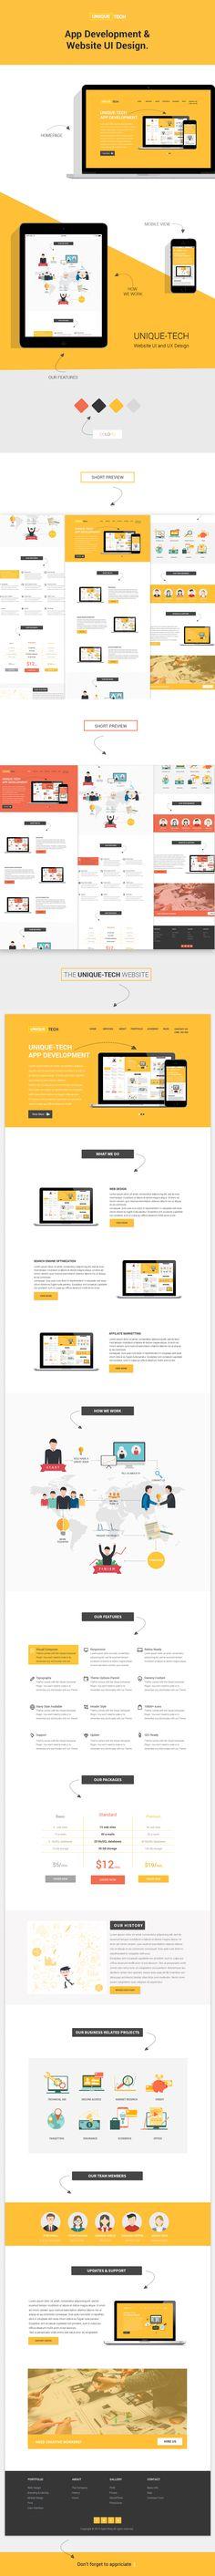 20 Creative Business Proposal Templates You Wonu0027t Believe Are - business proposal template microsoft word